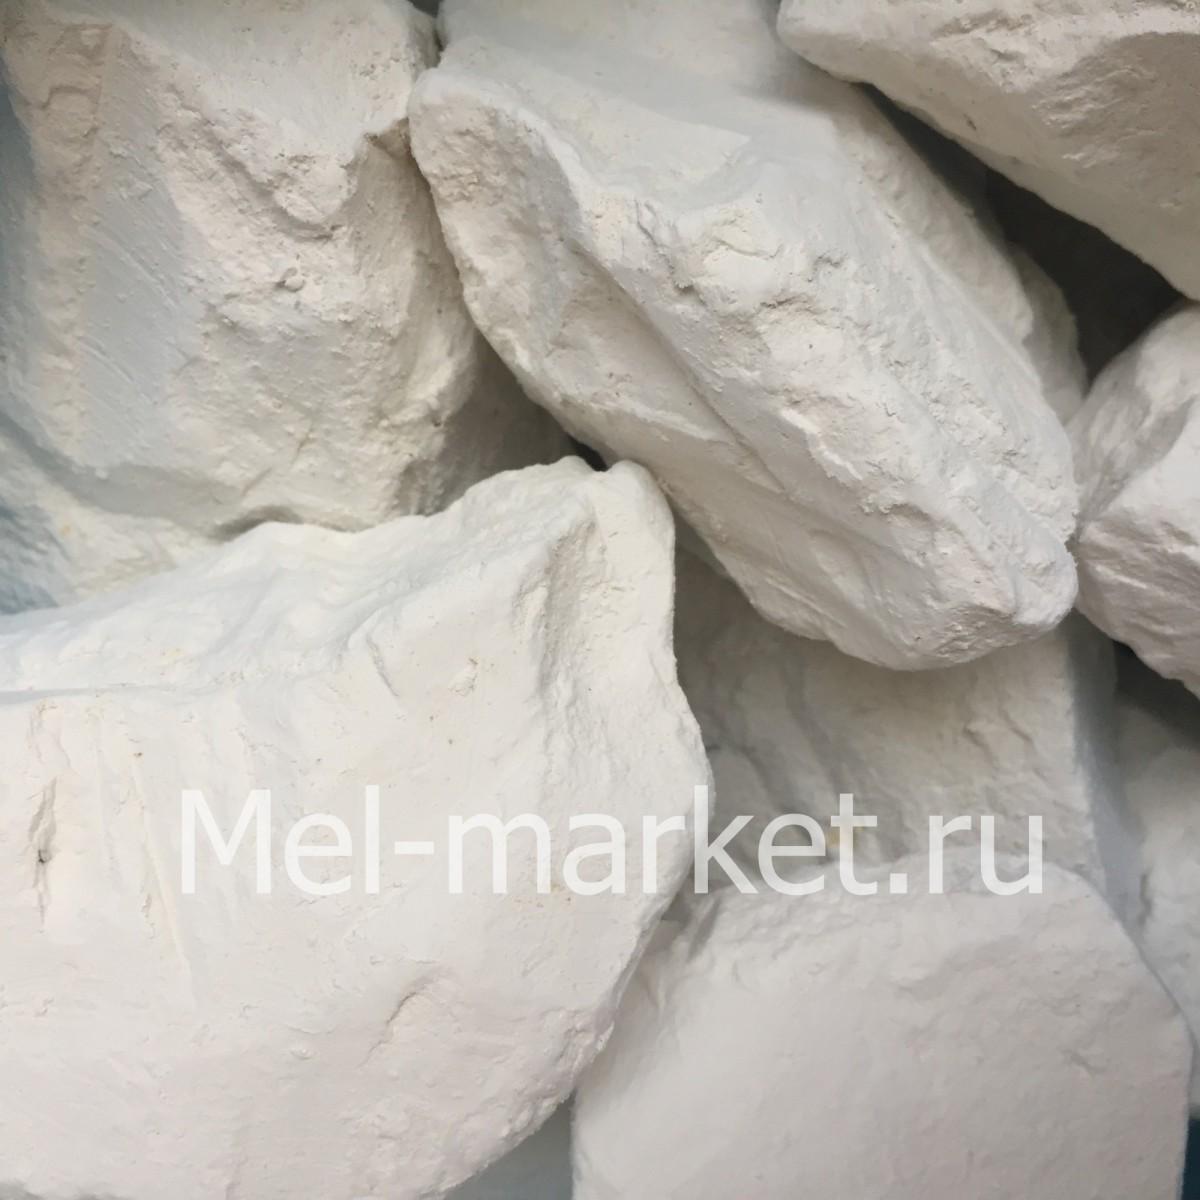 "Мел ""Новый Оскол"" - 500гр"